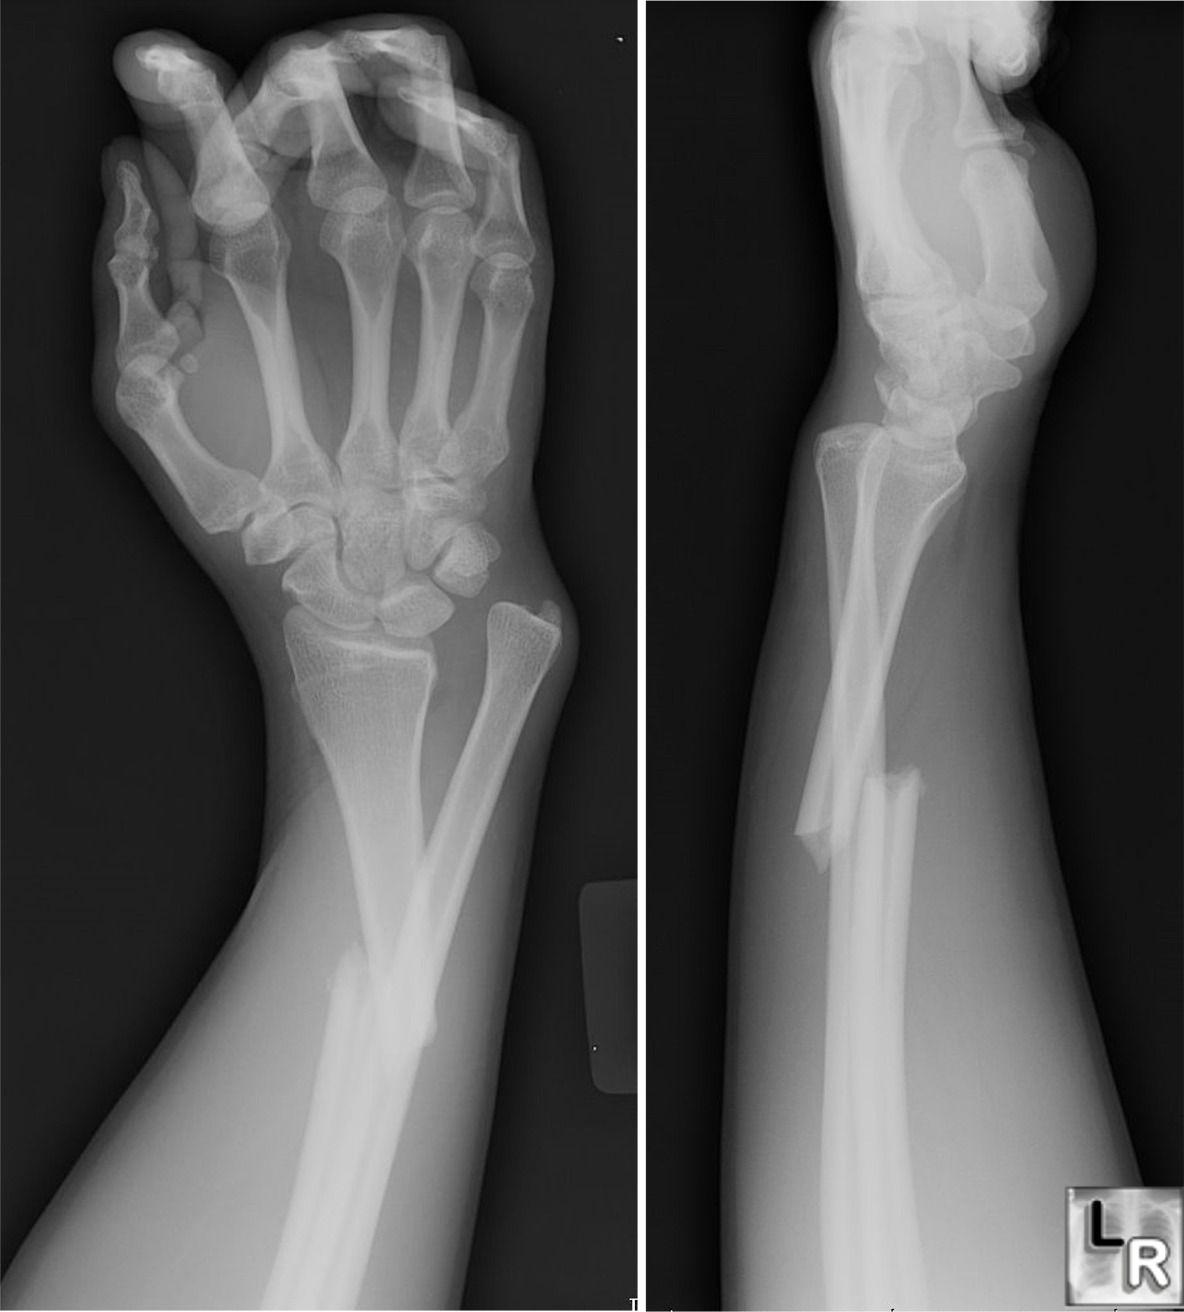 fracture of bone